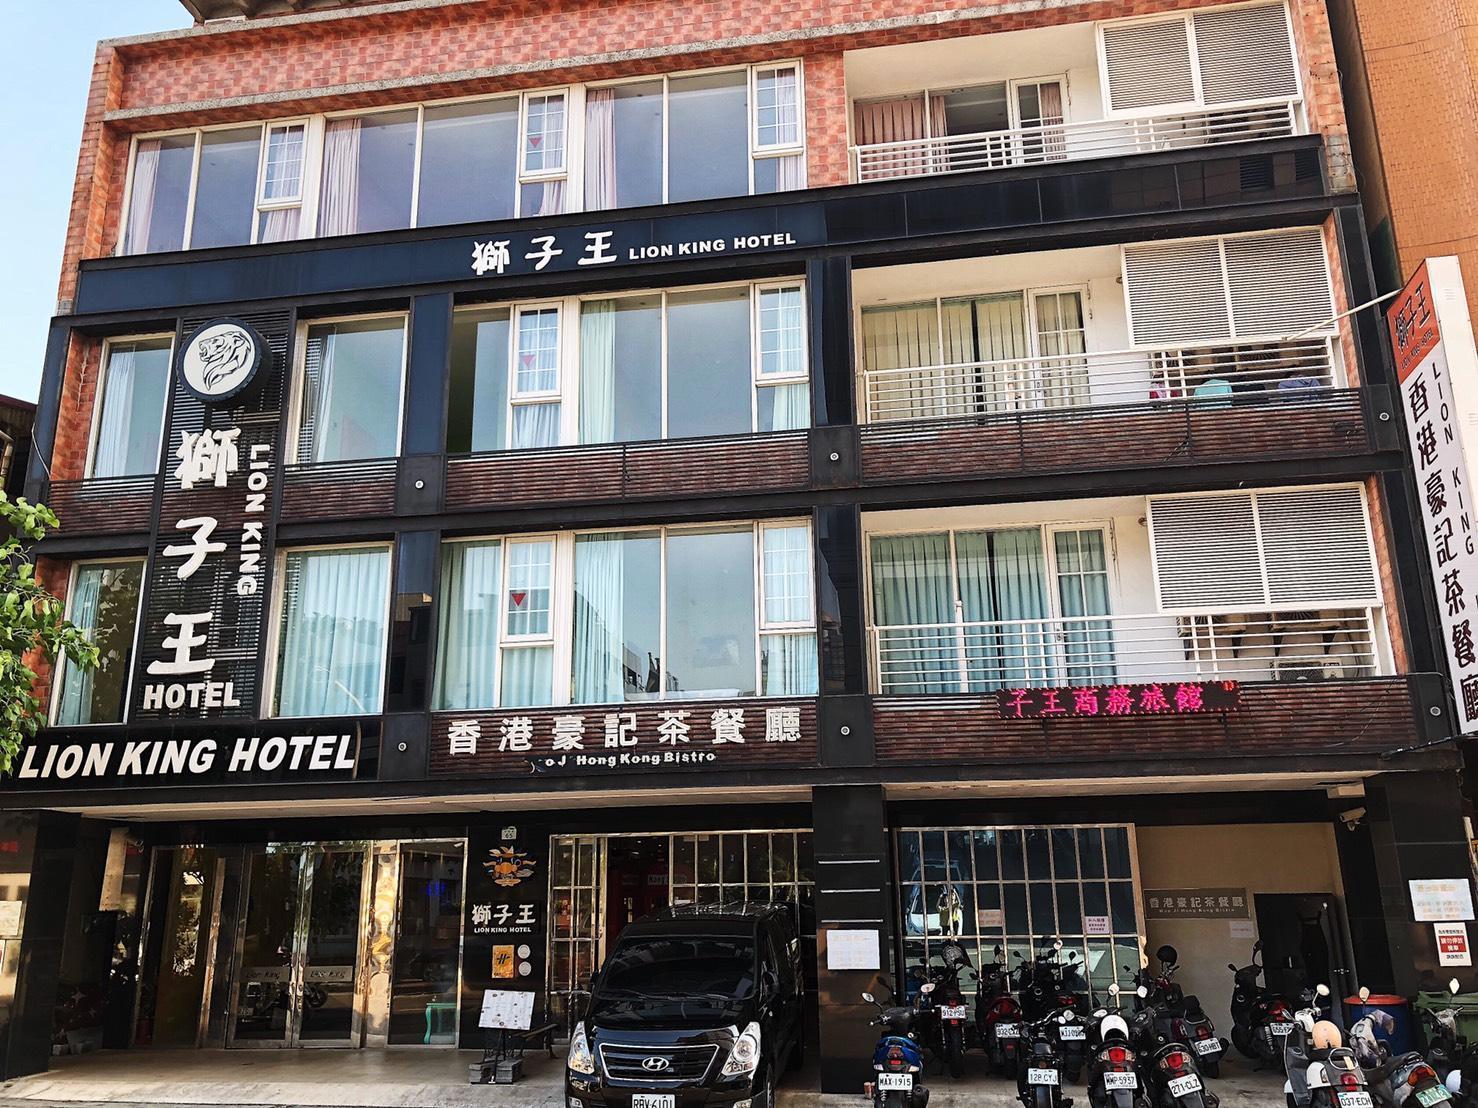 Lion King Hotel